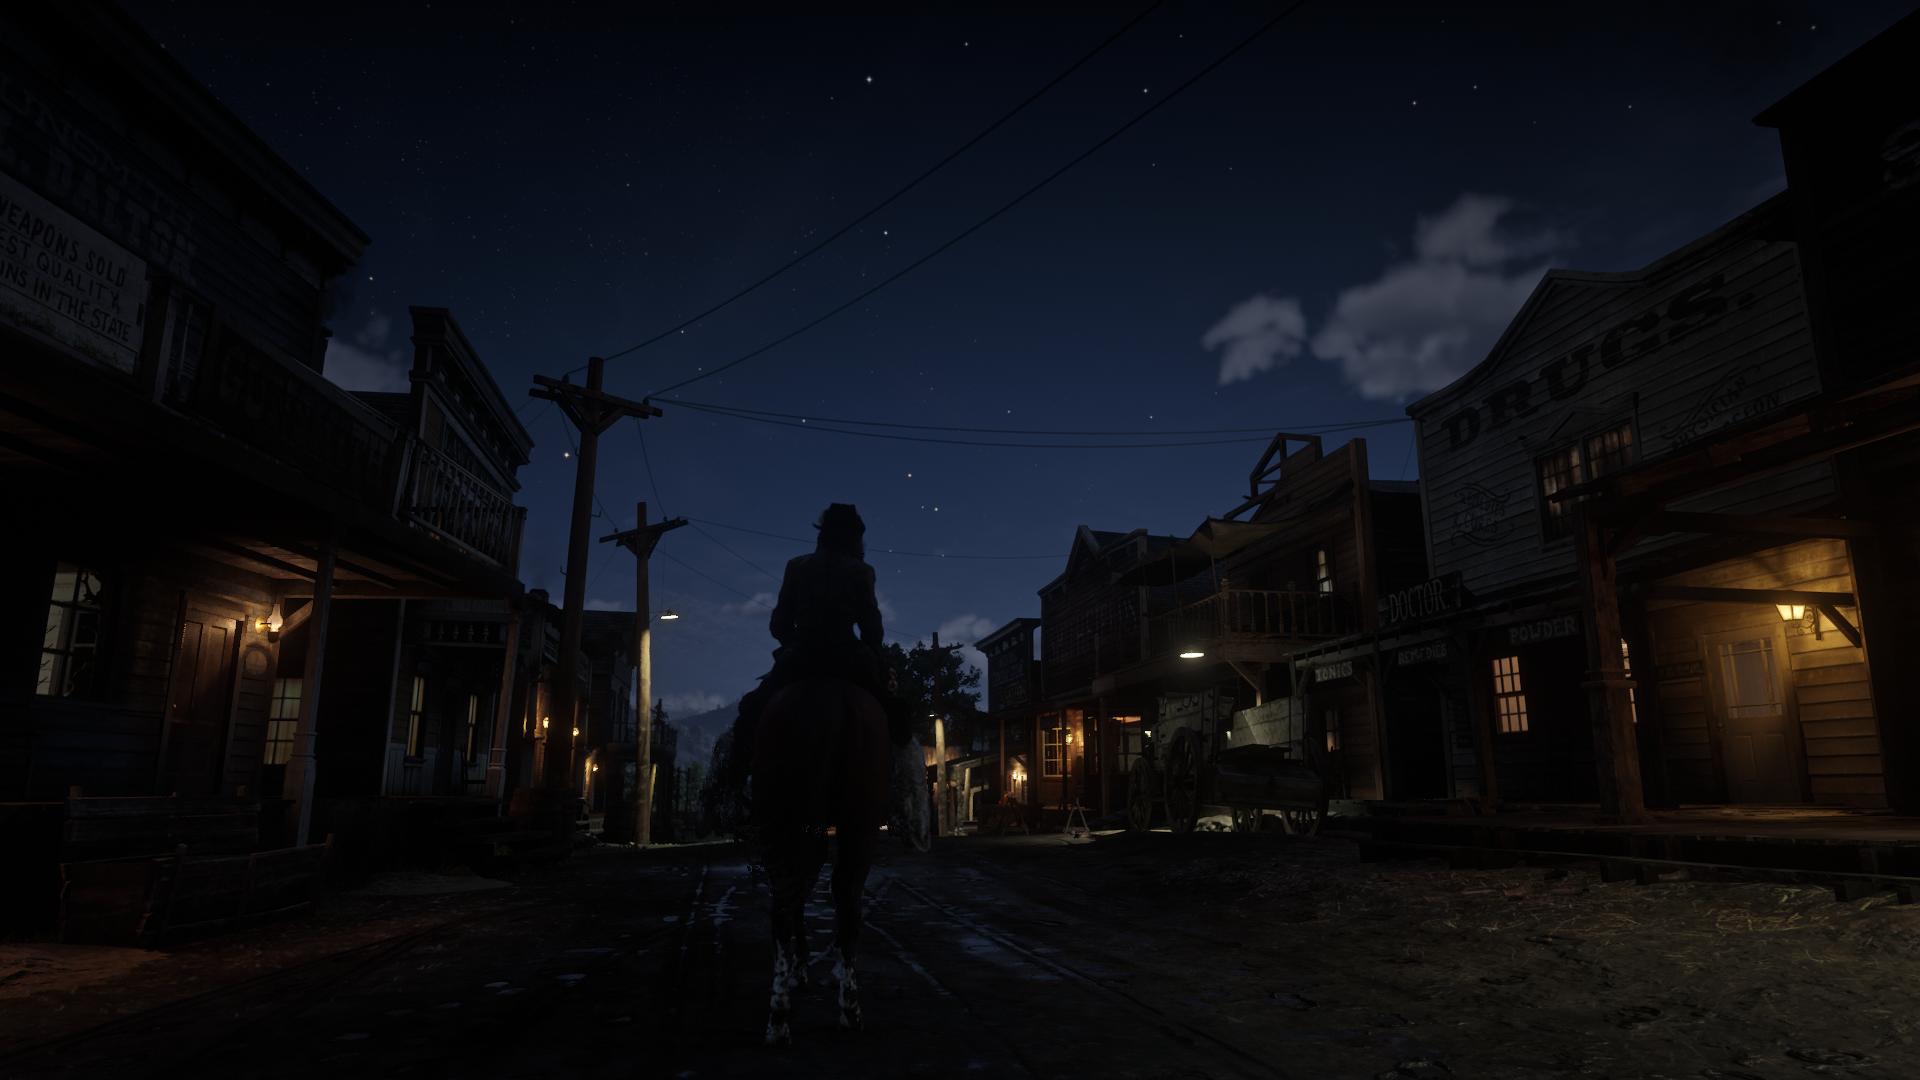 Ночь, улица... - Red Dead Redemption 2